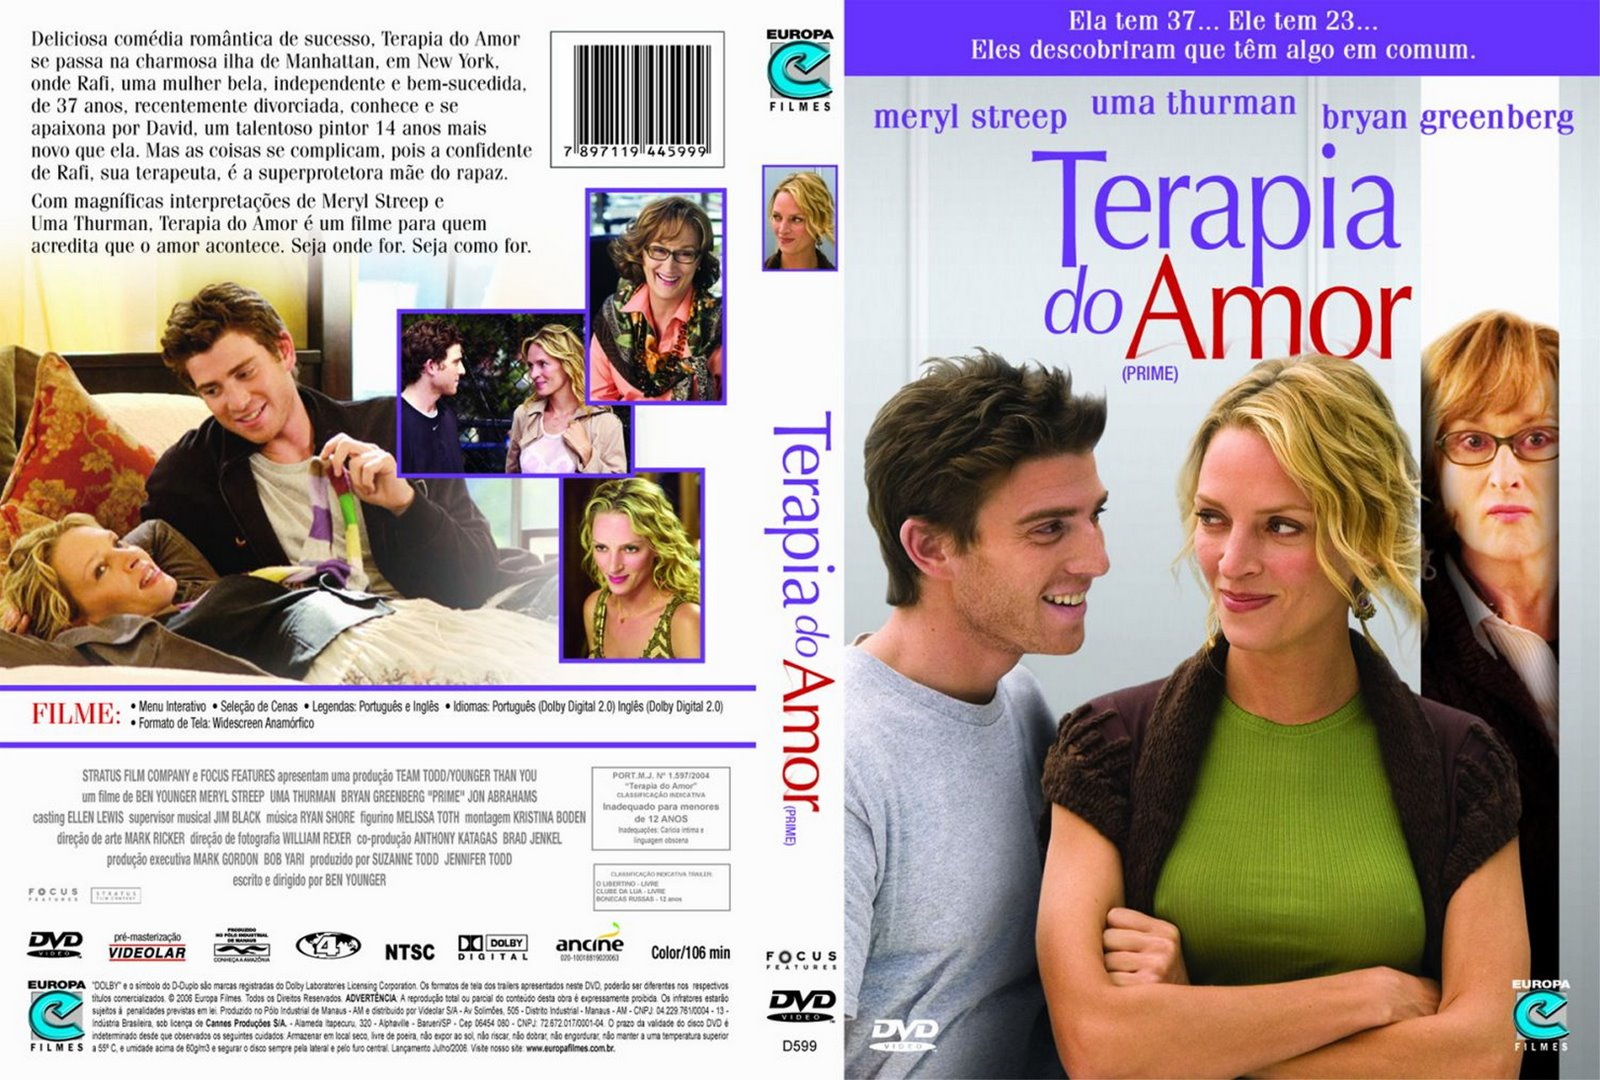 http://4.bp.blogspot.com/_UIkyBpFTkN0/TD3wIP6oHPI/AAAAAAAAAQo/JNTtG-zIvSY/s1600/Terapia_Do_Amor_BR.jpg